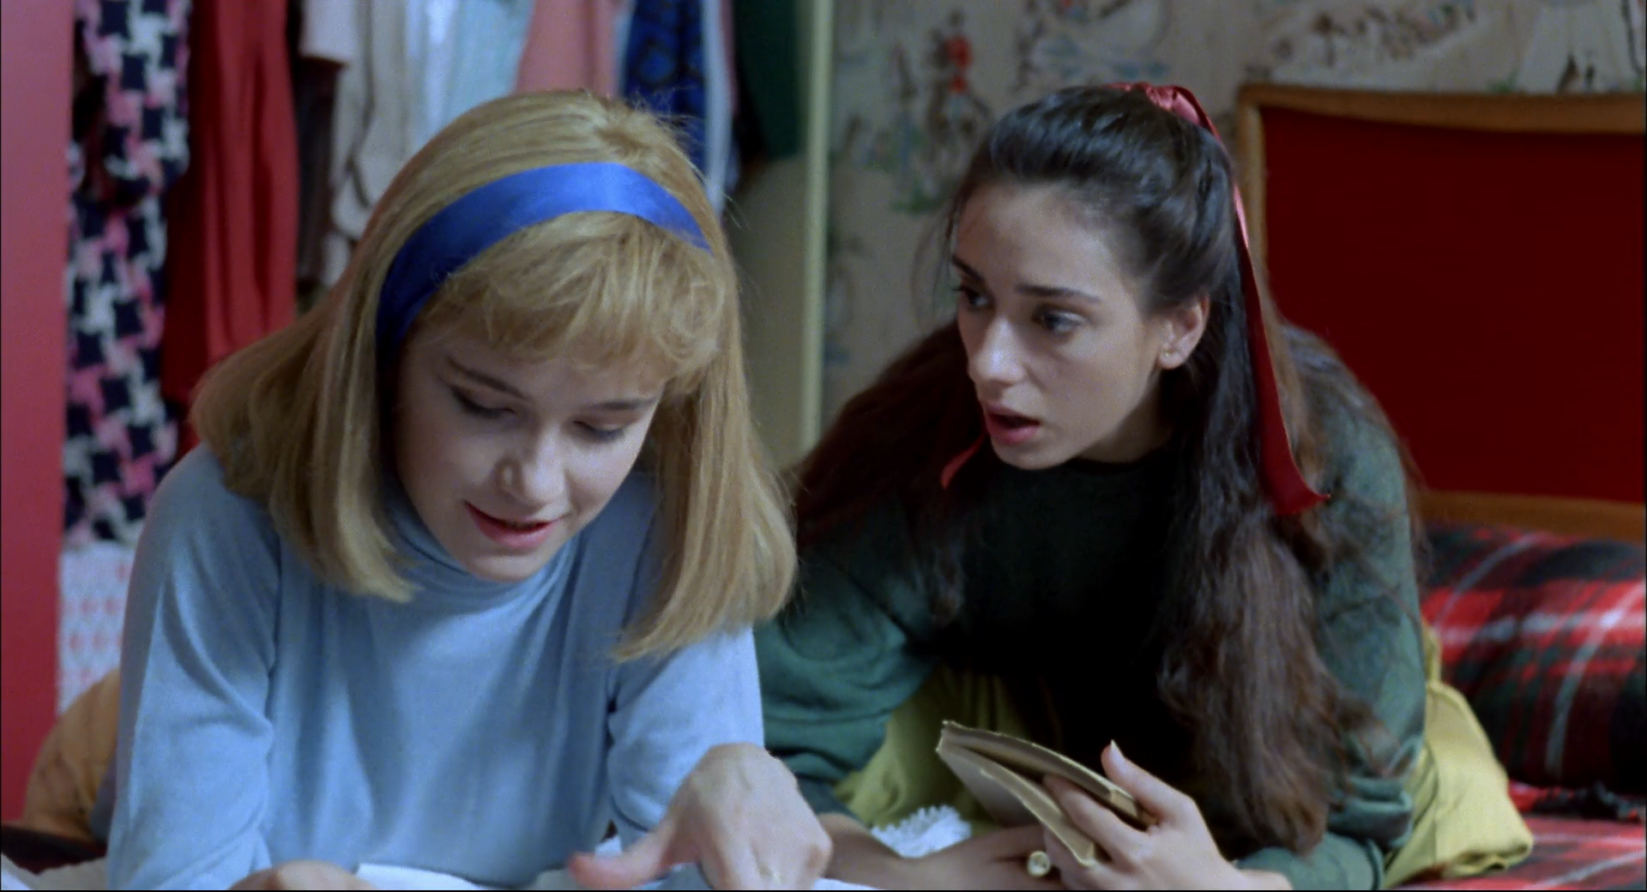 sptZEz - Las edades de Lulú | 1990 | Drama. Erótico | BDrip 1080p | castellano DTS 5.1 | 11 GB